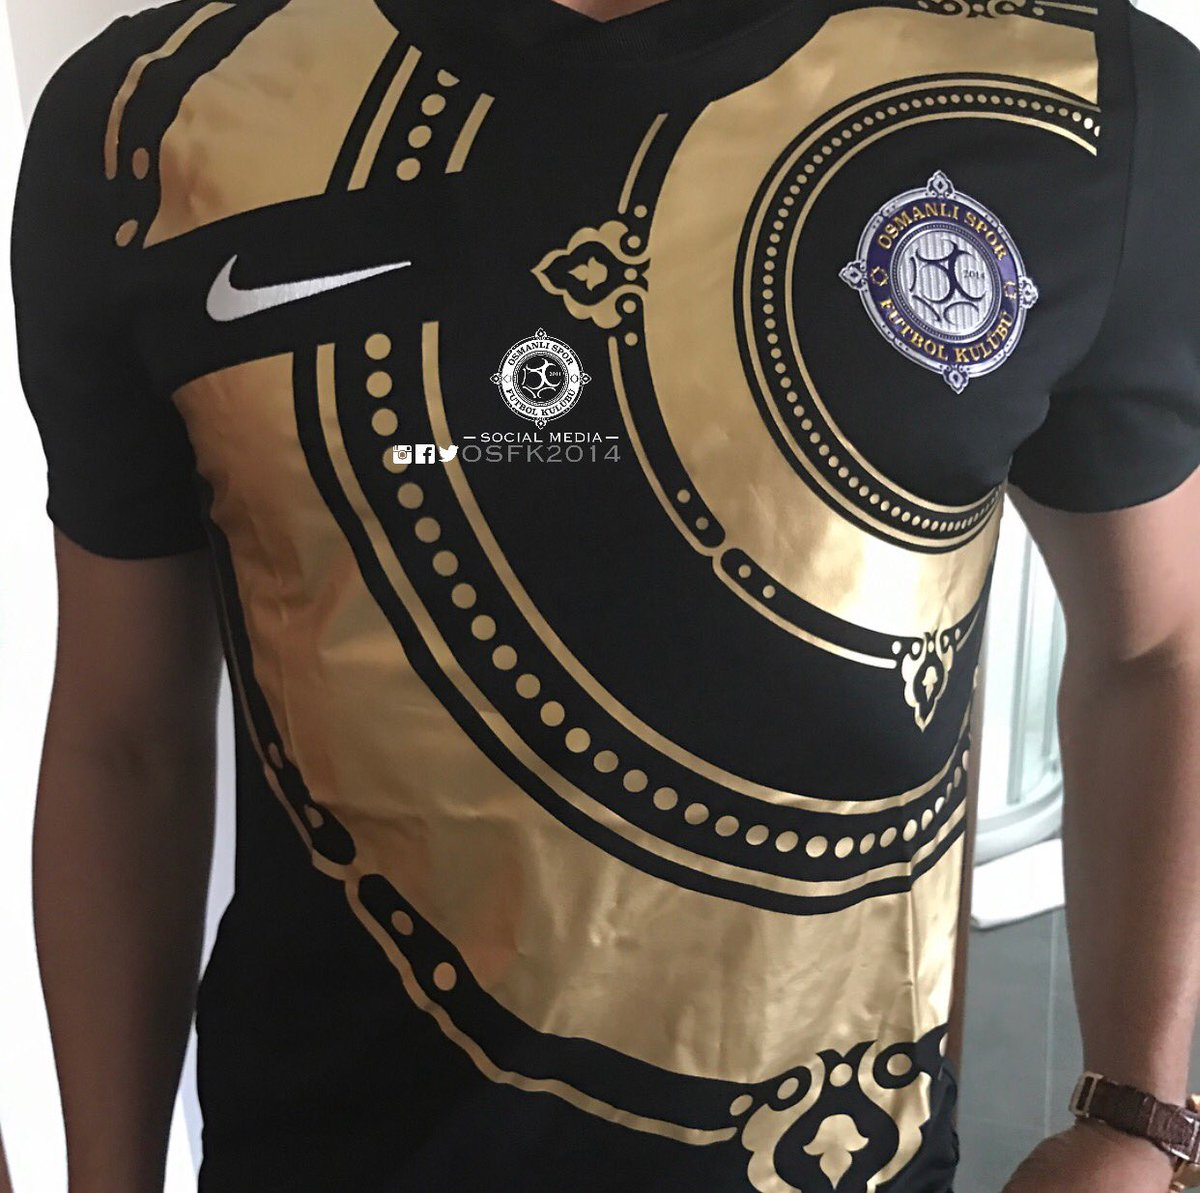 Insane+Nike+Osmanlispor+17-18+Kits+Revea